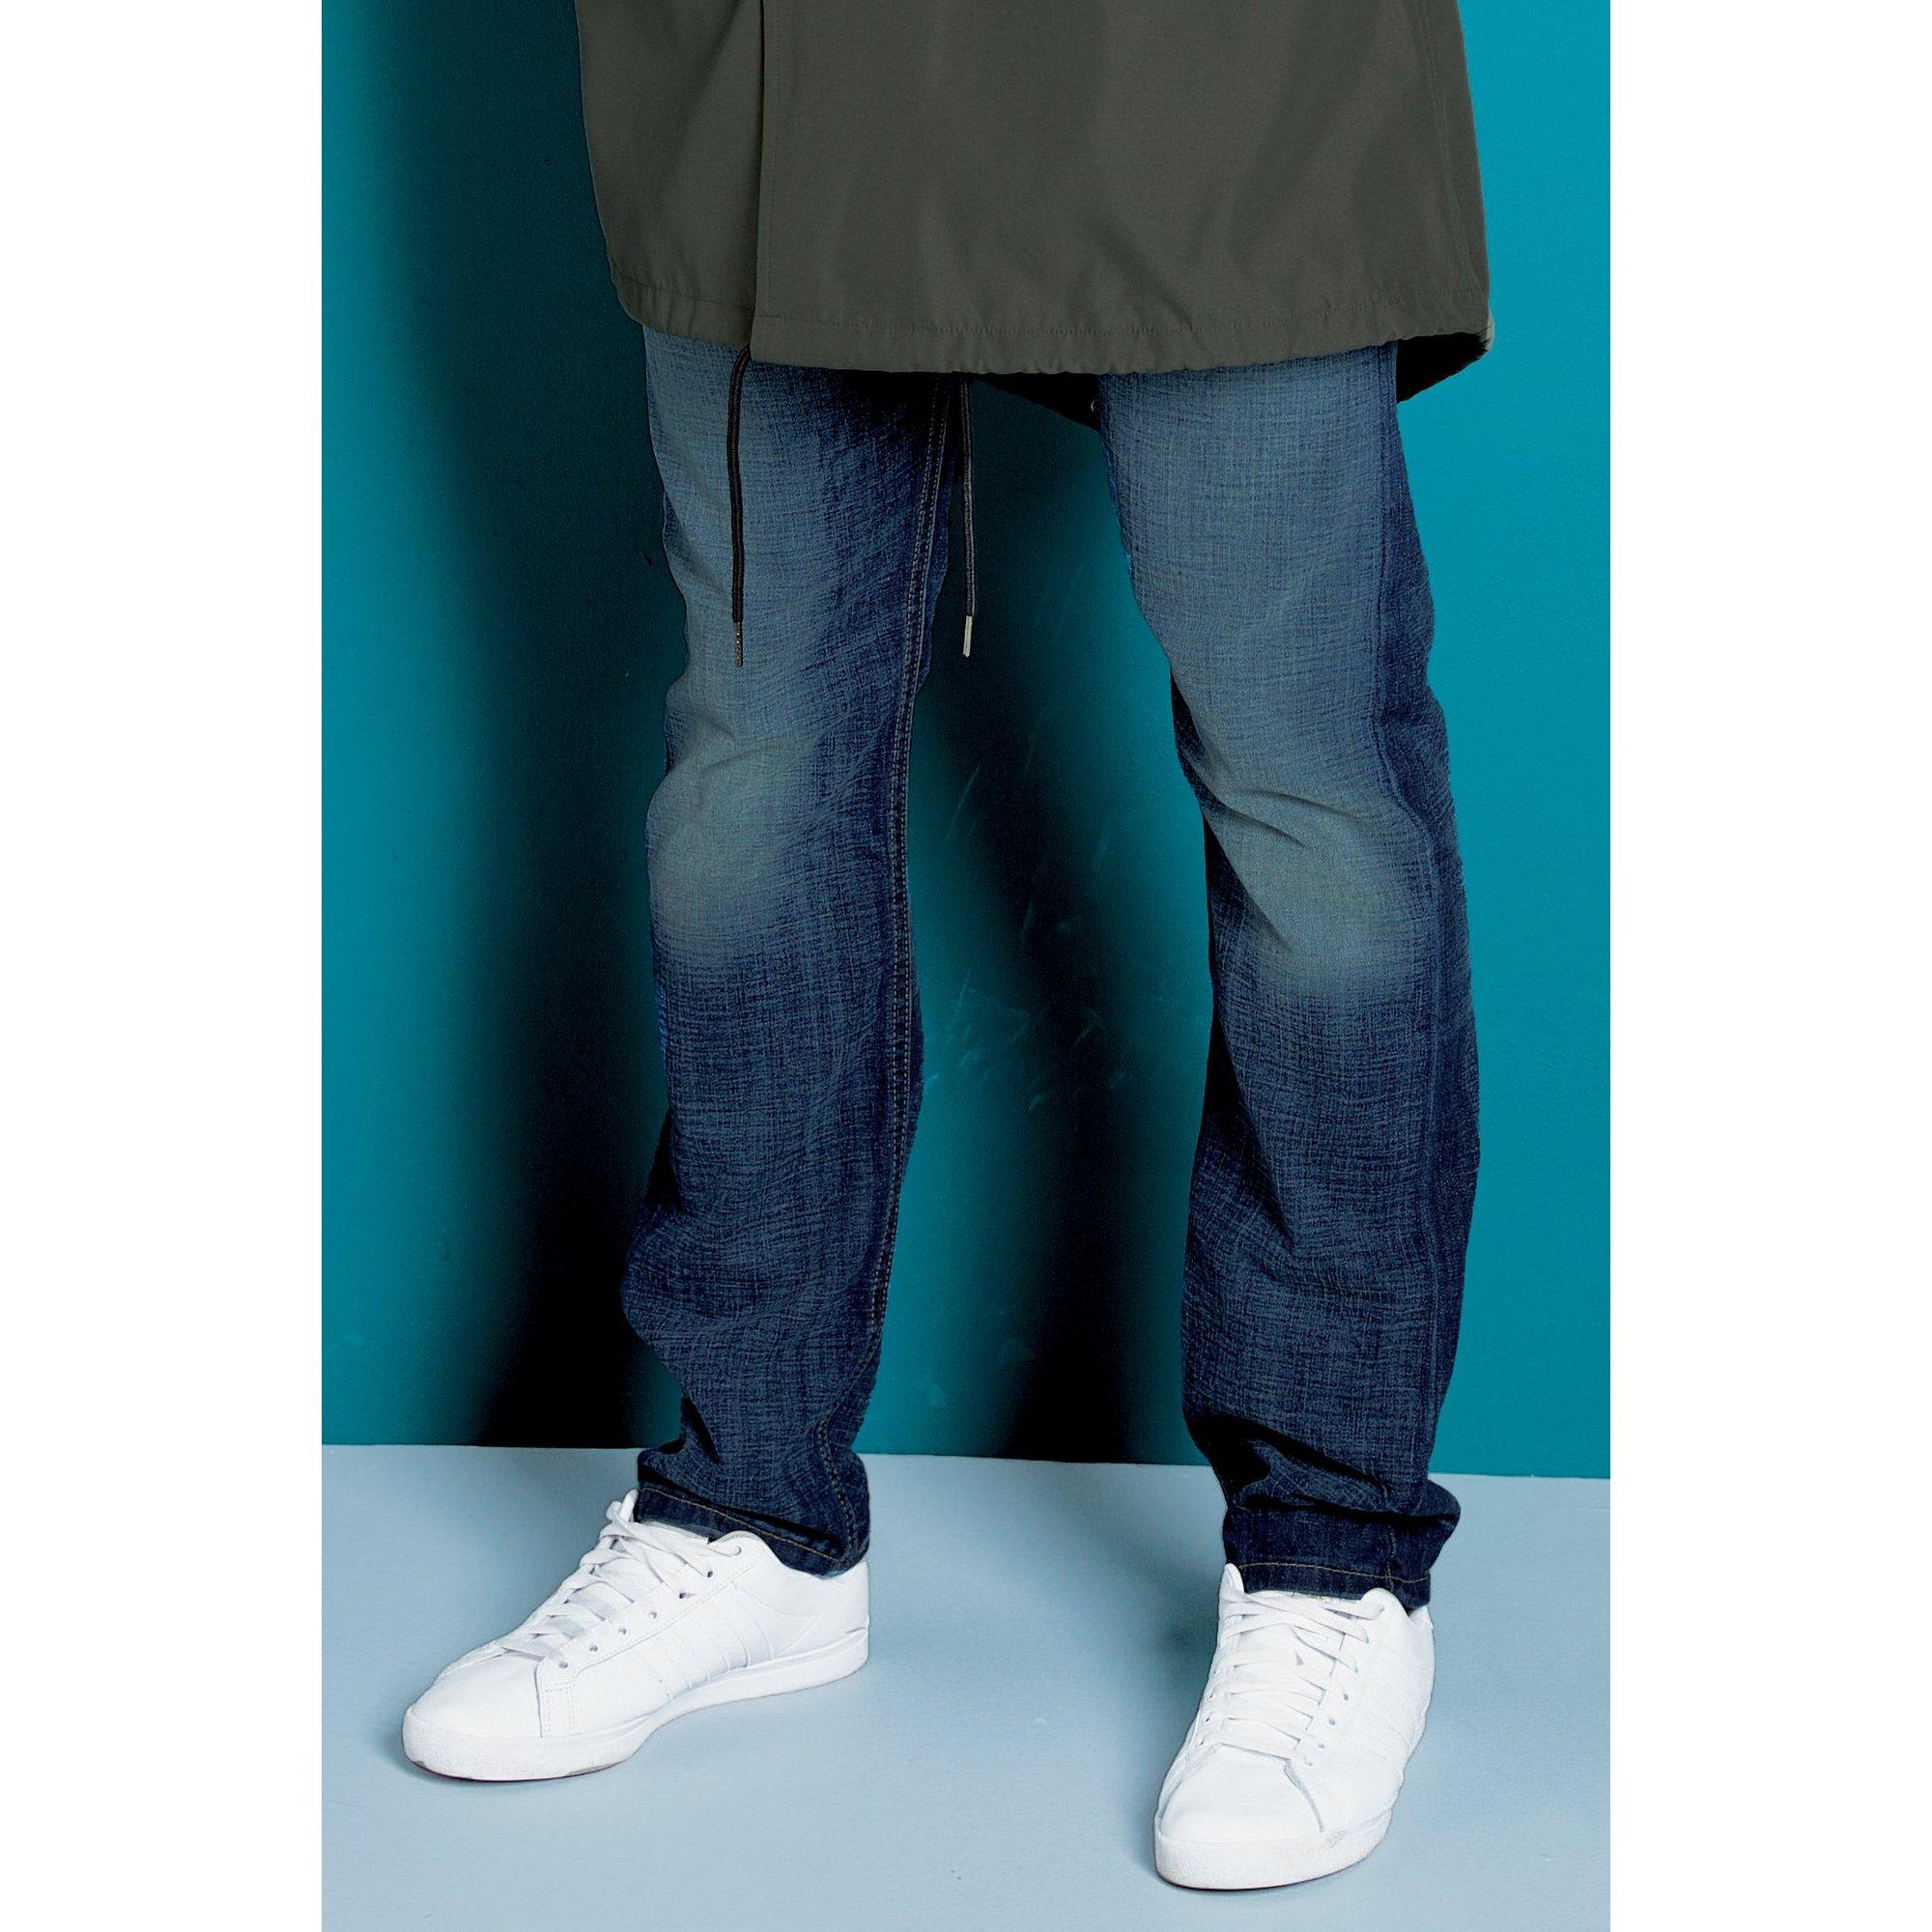 Image of Levis 513 Slim Fit Straight Leg Jeans